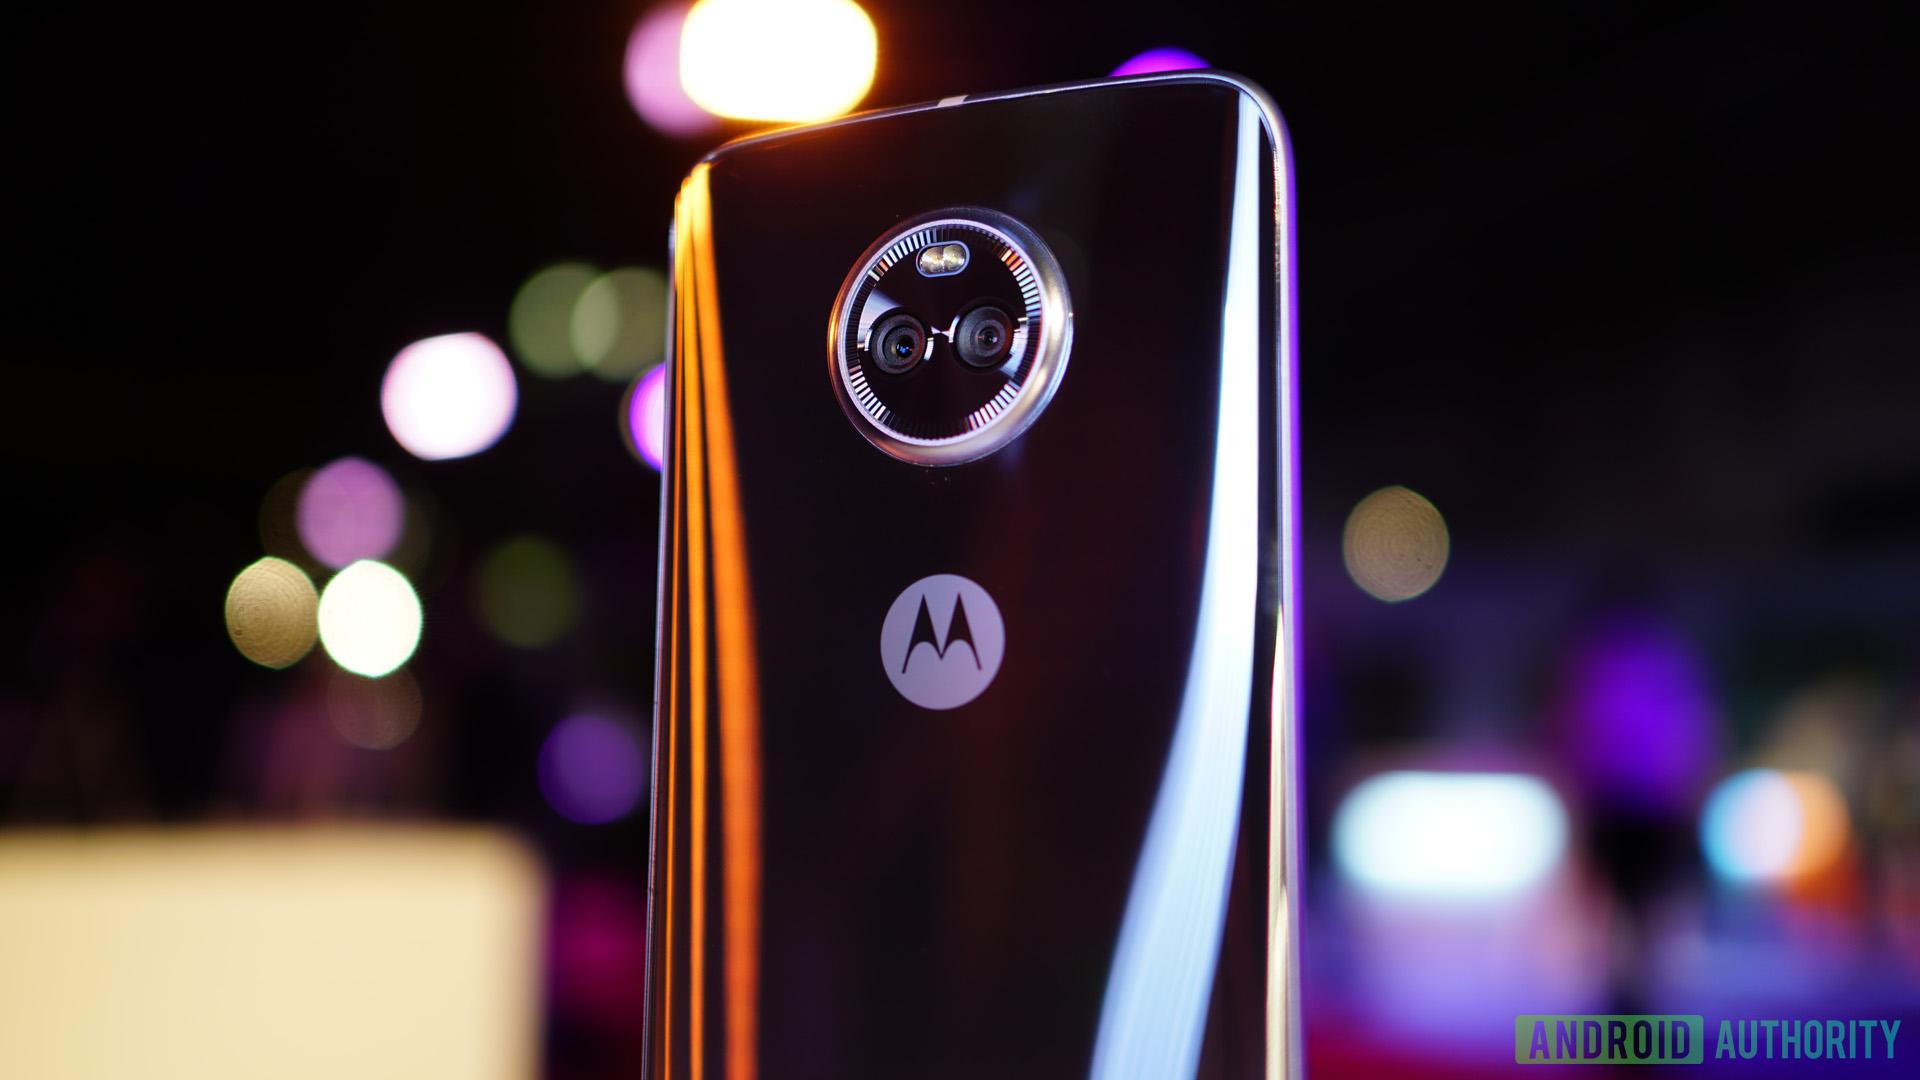 The Motorola Moto X4 from behind.